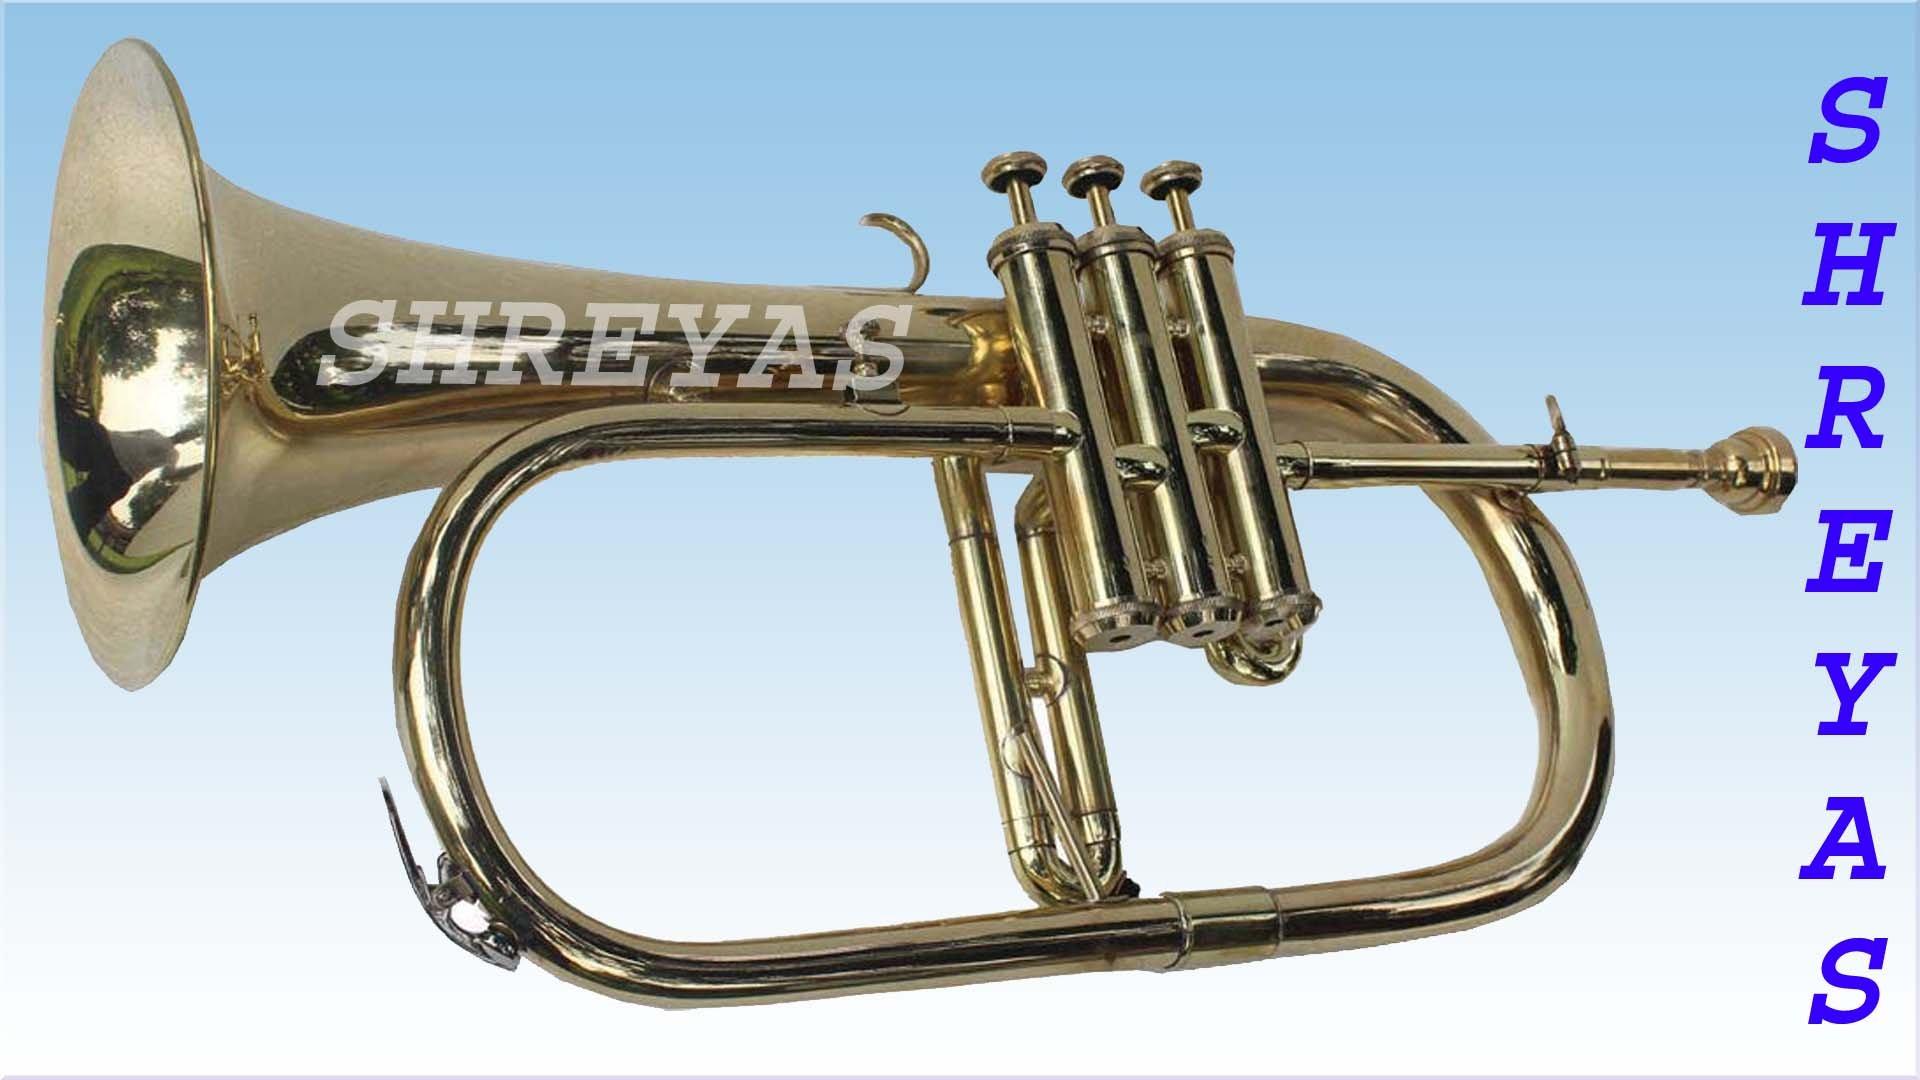 Shreyas Great Value 3-Valve Bb Natural Brass Flugel Horn Flugelhorn with Designer Hardcase VTR156 by SHREYAS